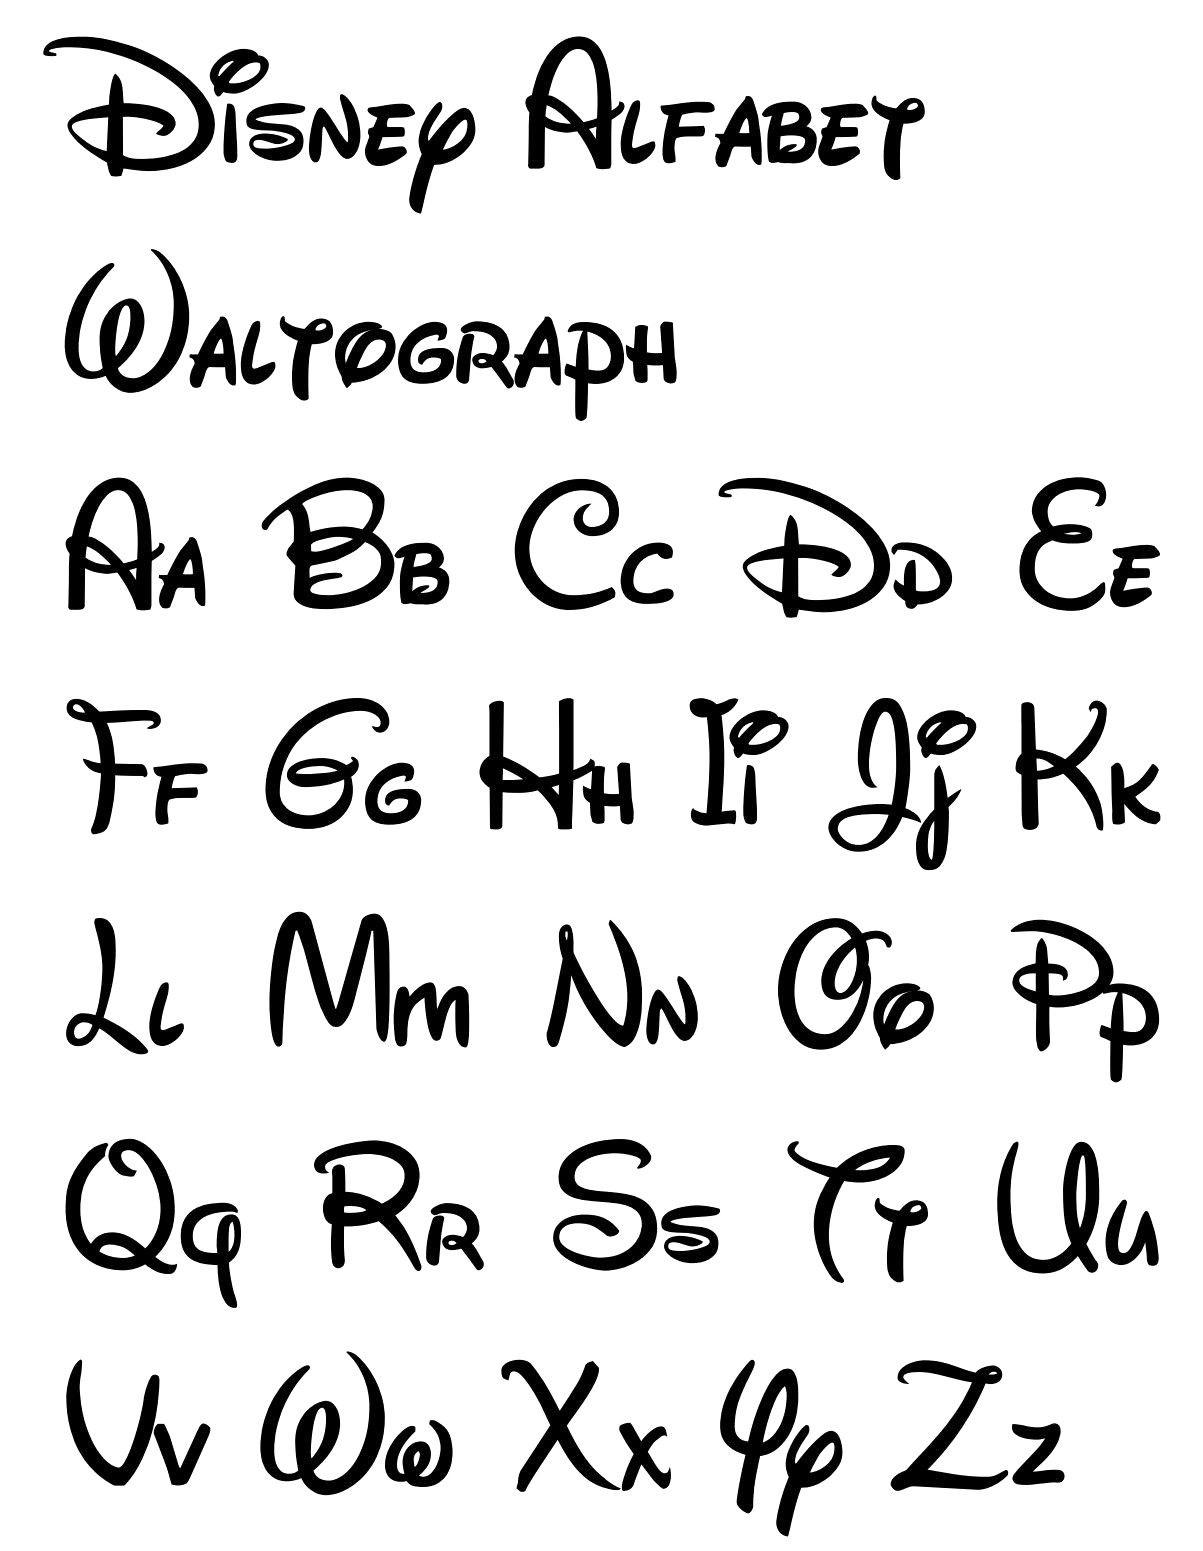 Free Printable Disney Letter Stencils | Disney In 2019 | Disney - Free Printable Disney Alphabet Letters